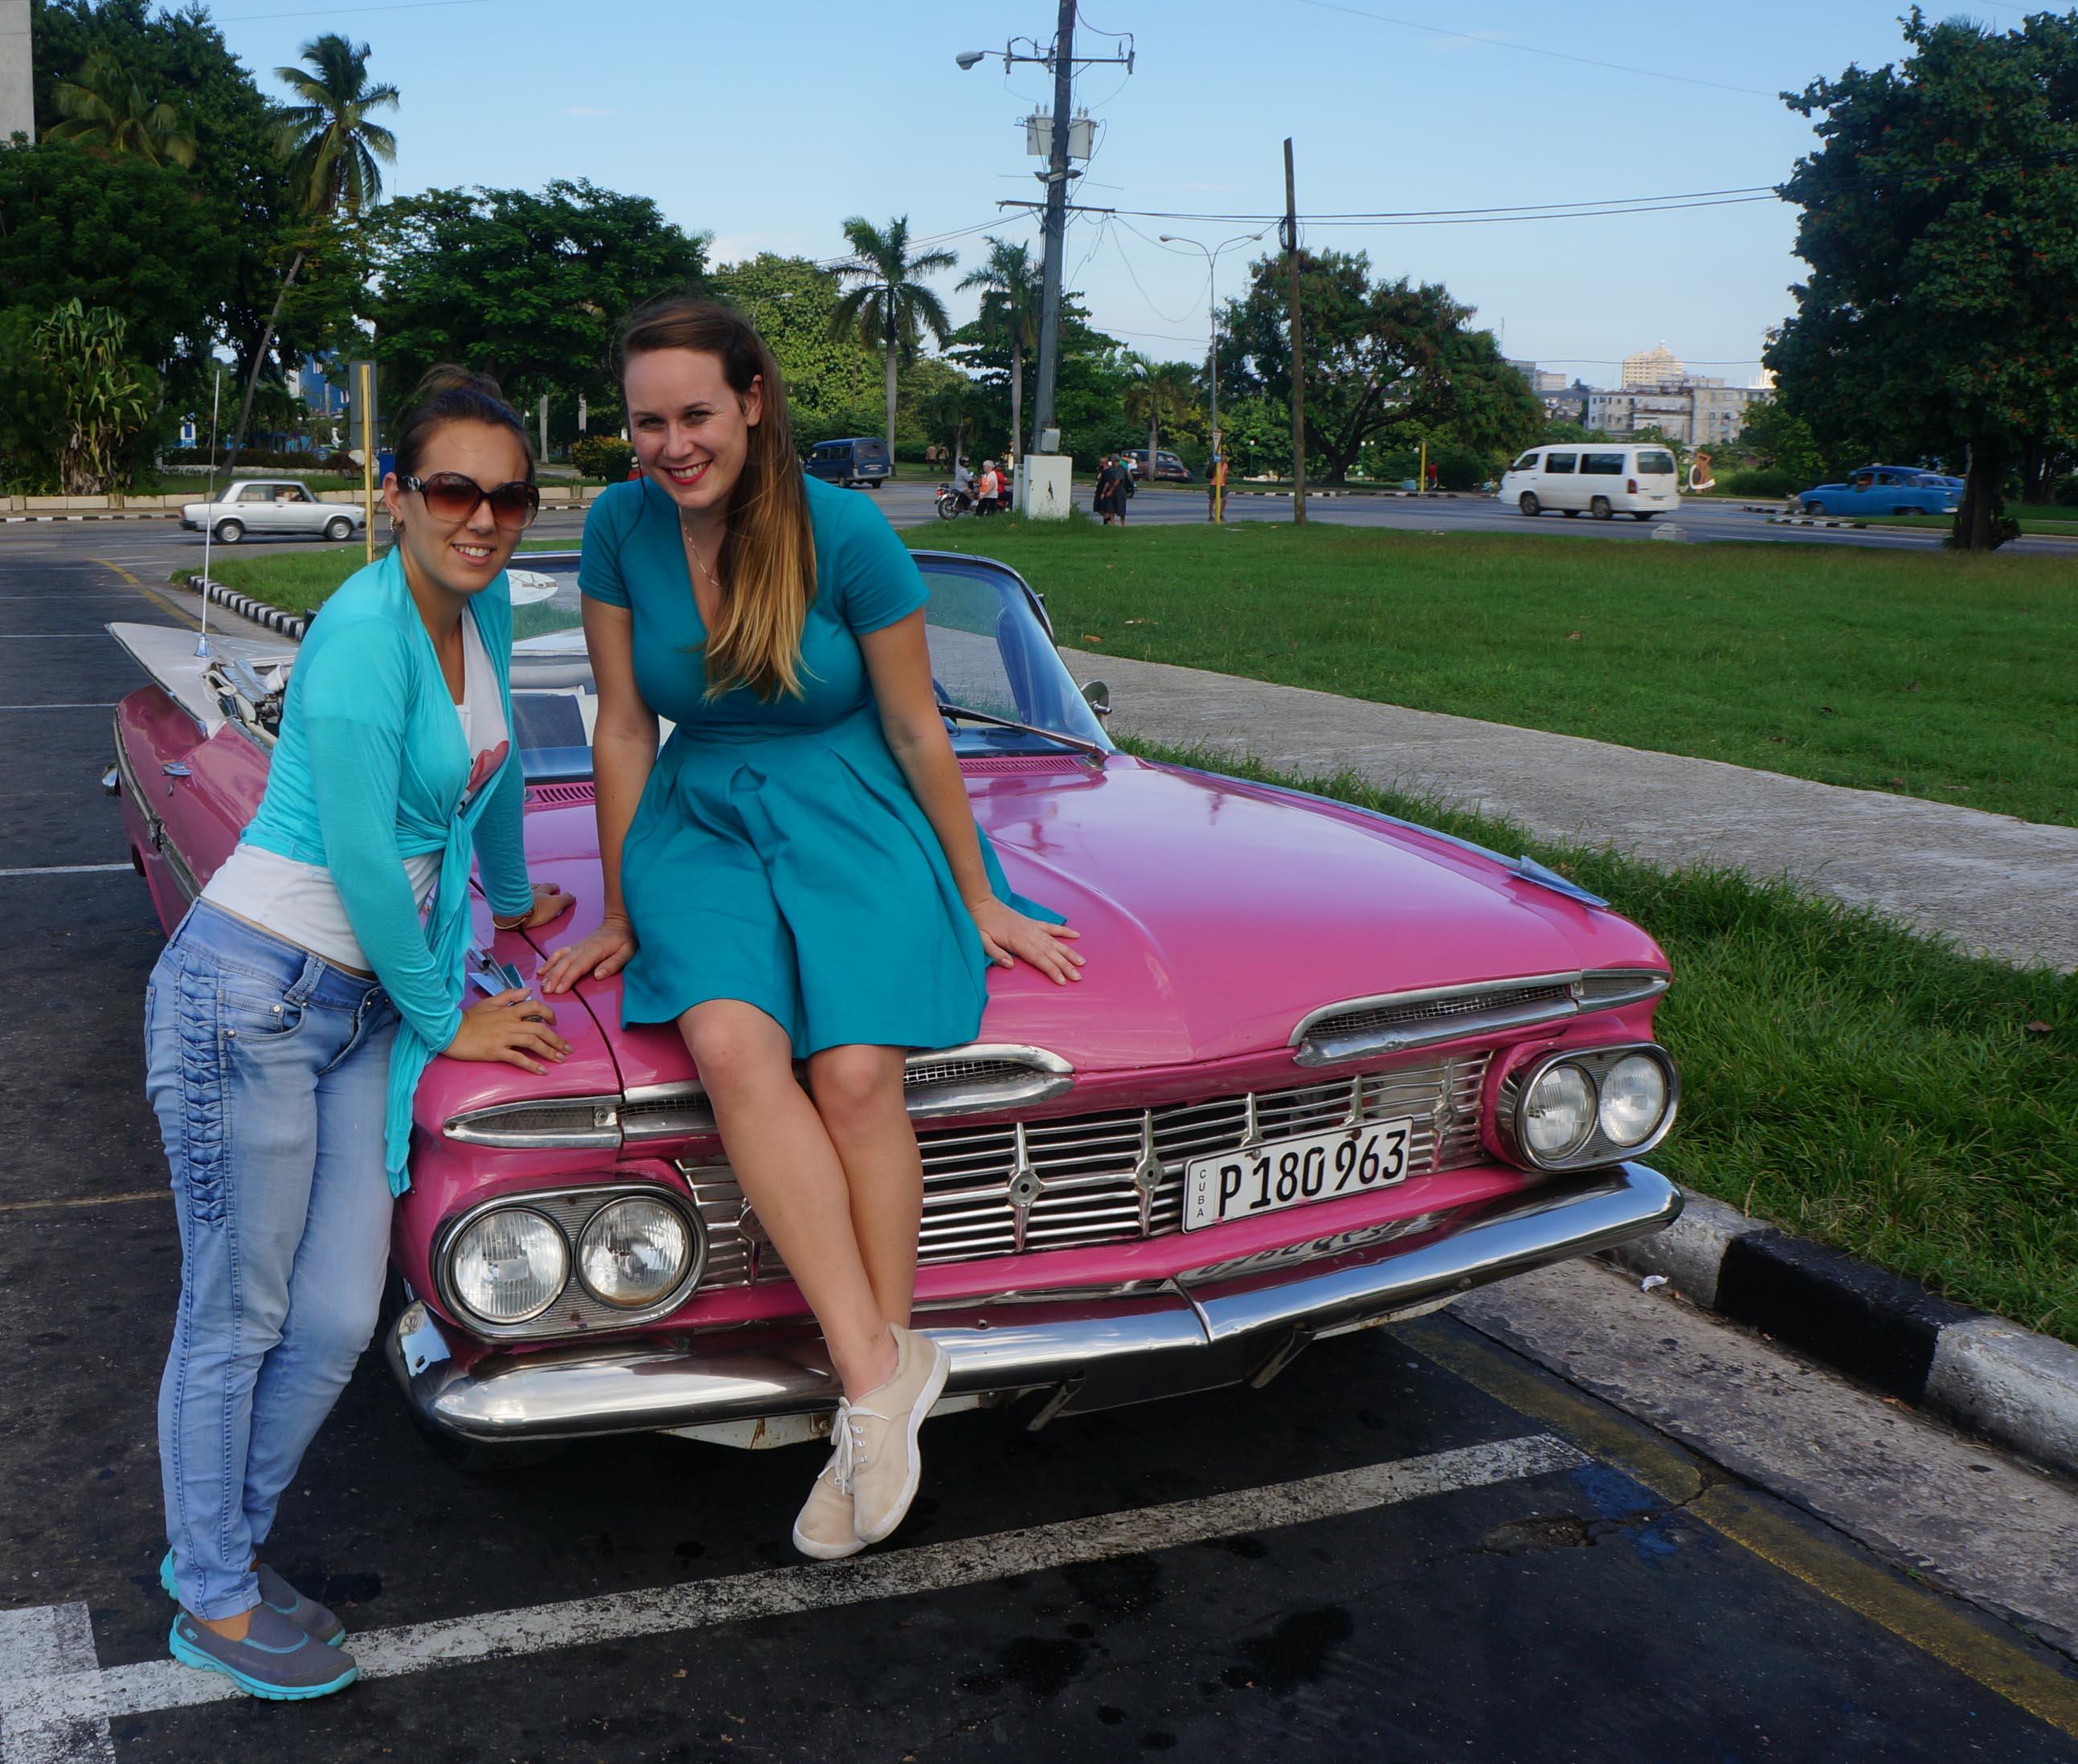 Touring Havana: A Look at Cuba's Most Historic Sights